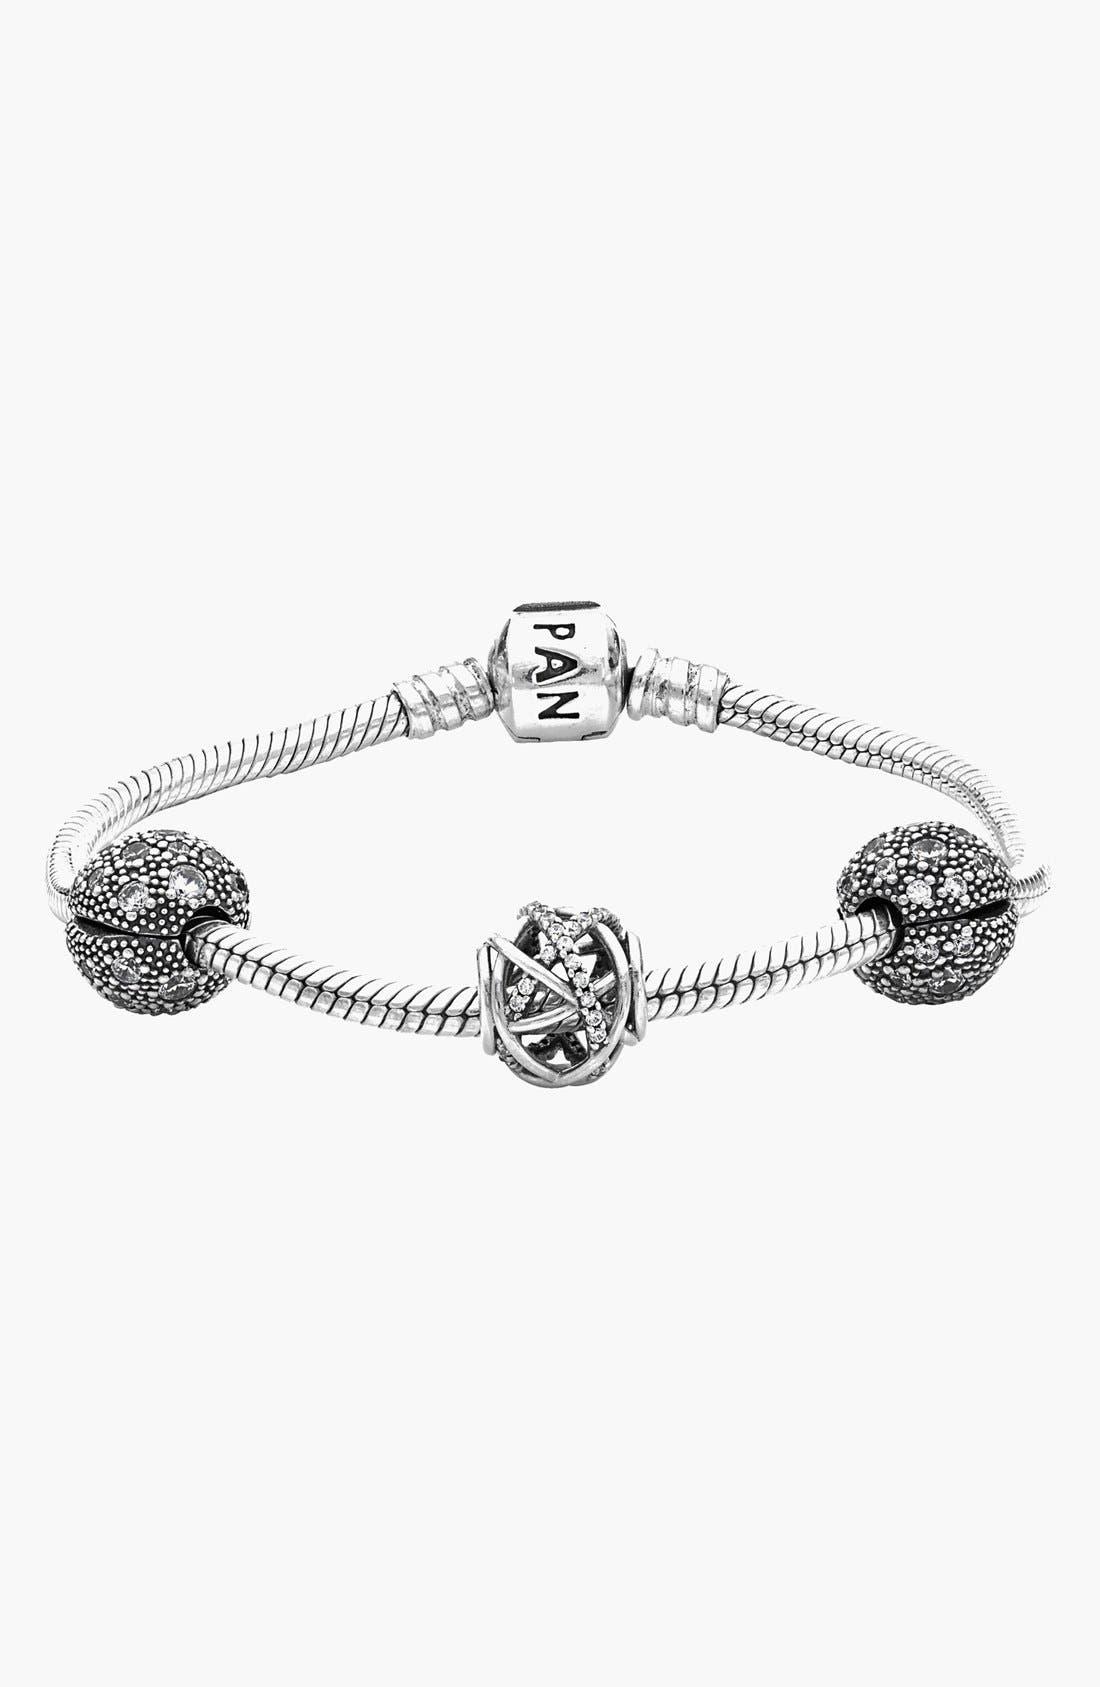 Alternate Image 1 Selected - PANDORA 'Stargazer' Bracelet and Charms